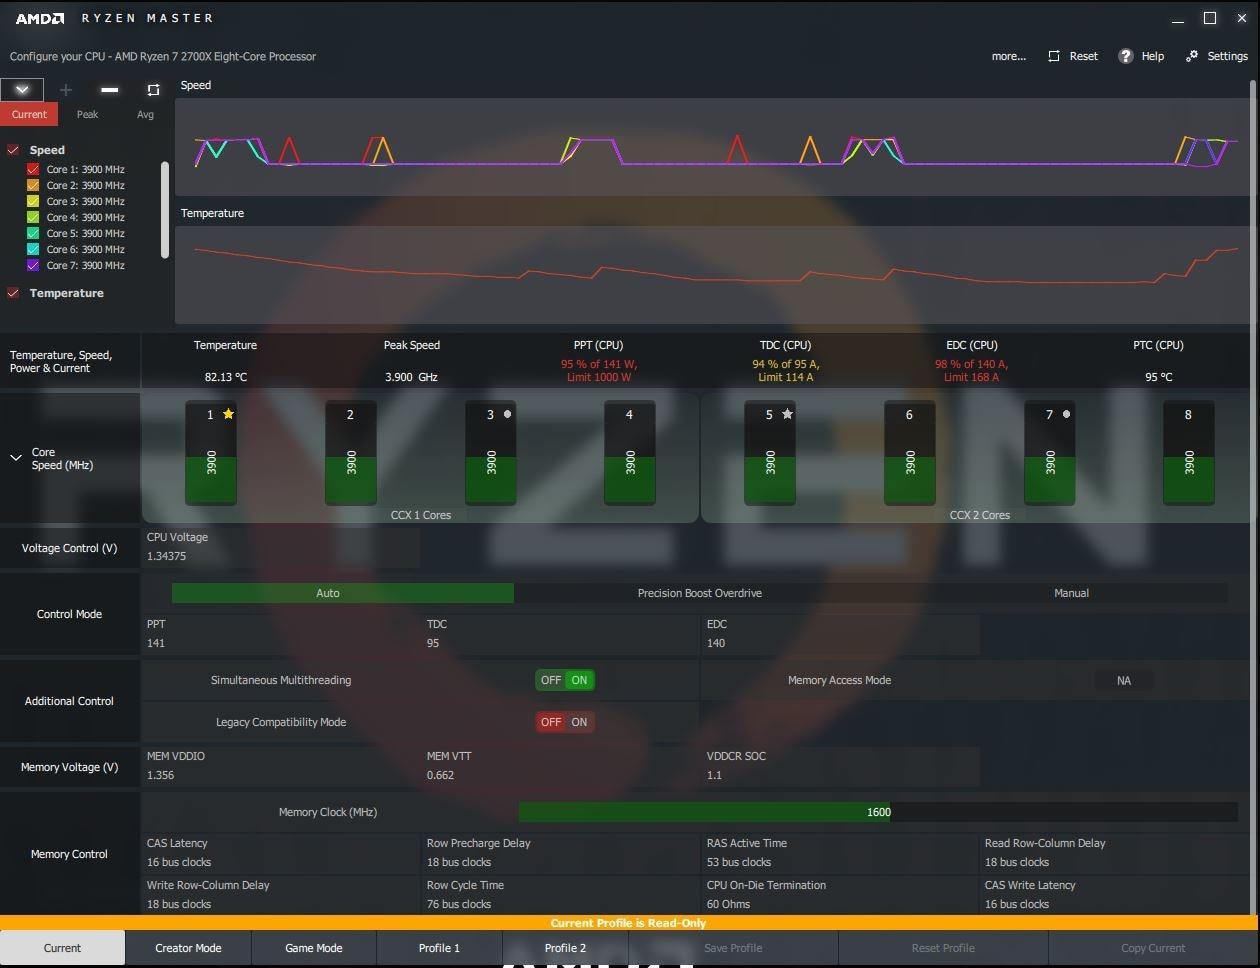 Buy the AMD Ryzen Threadripper 2920X 12 Cores, 24 Threads